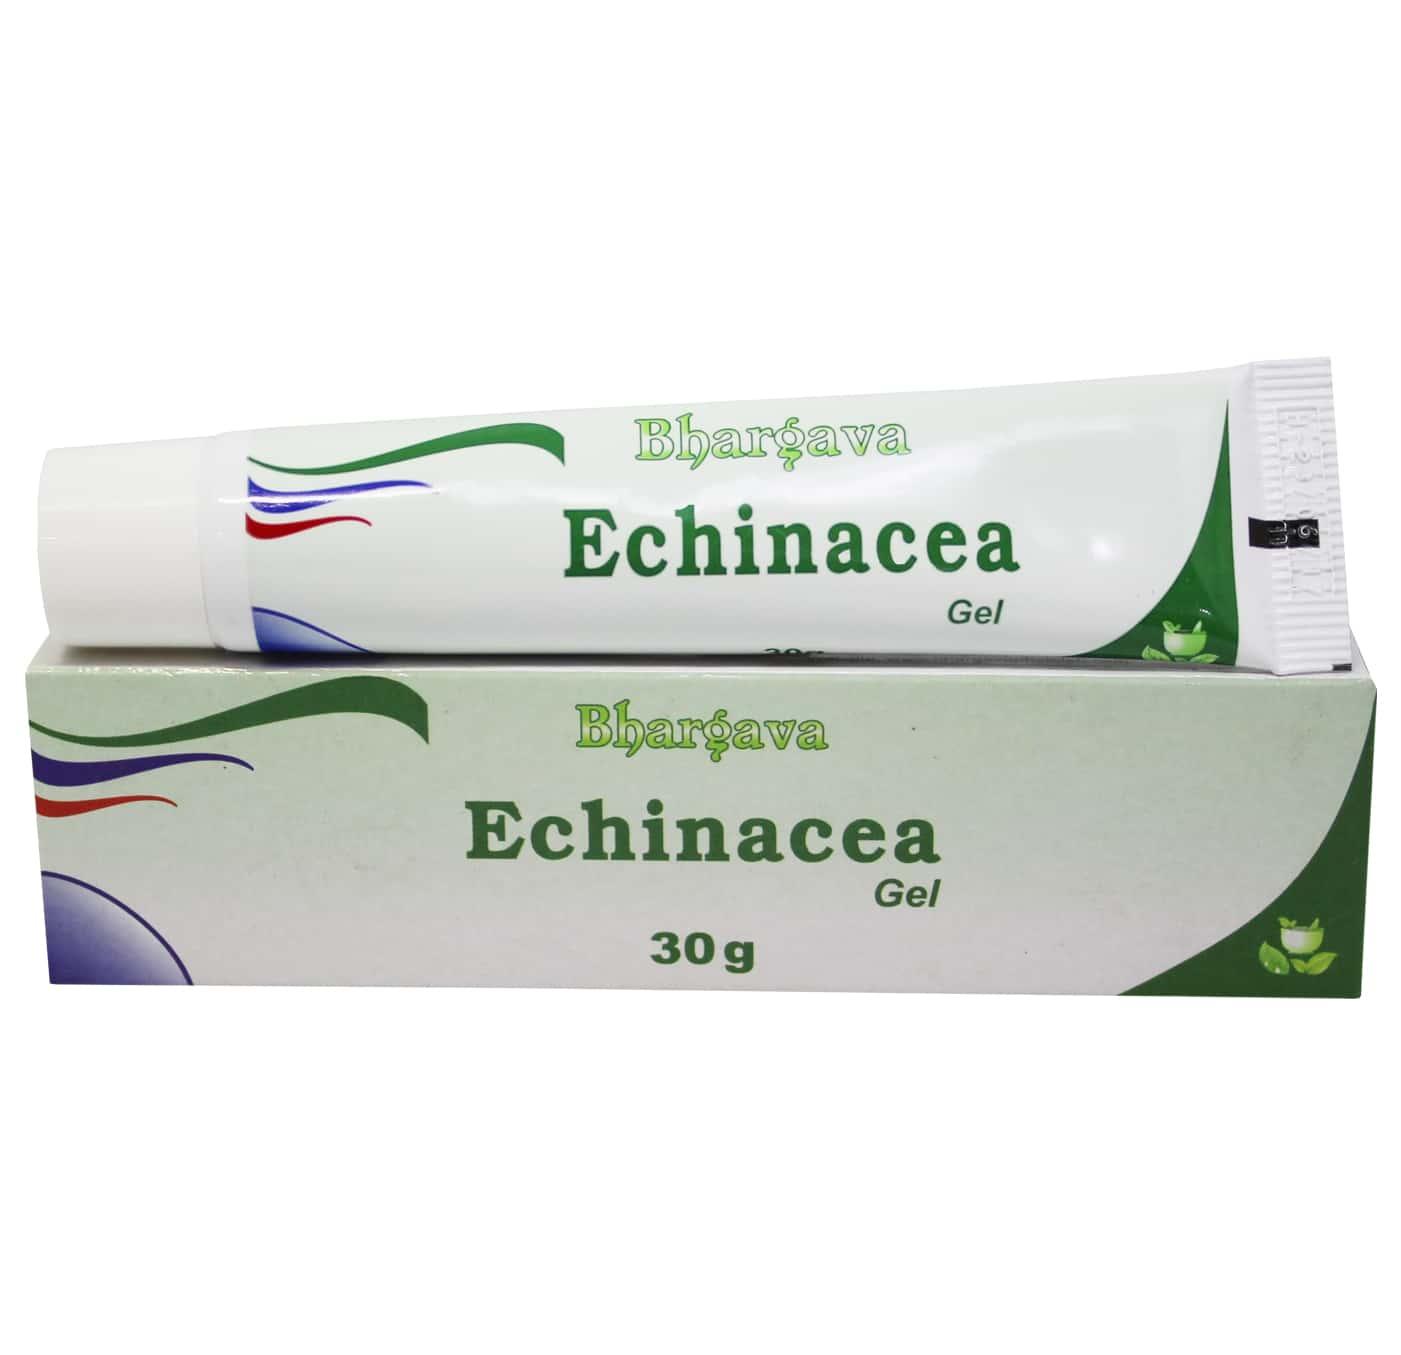 Echinacea Gel style=